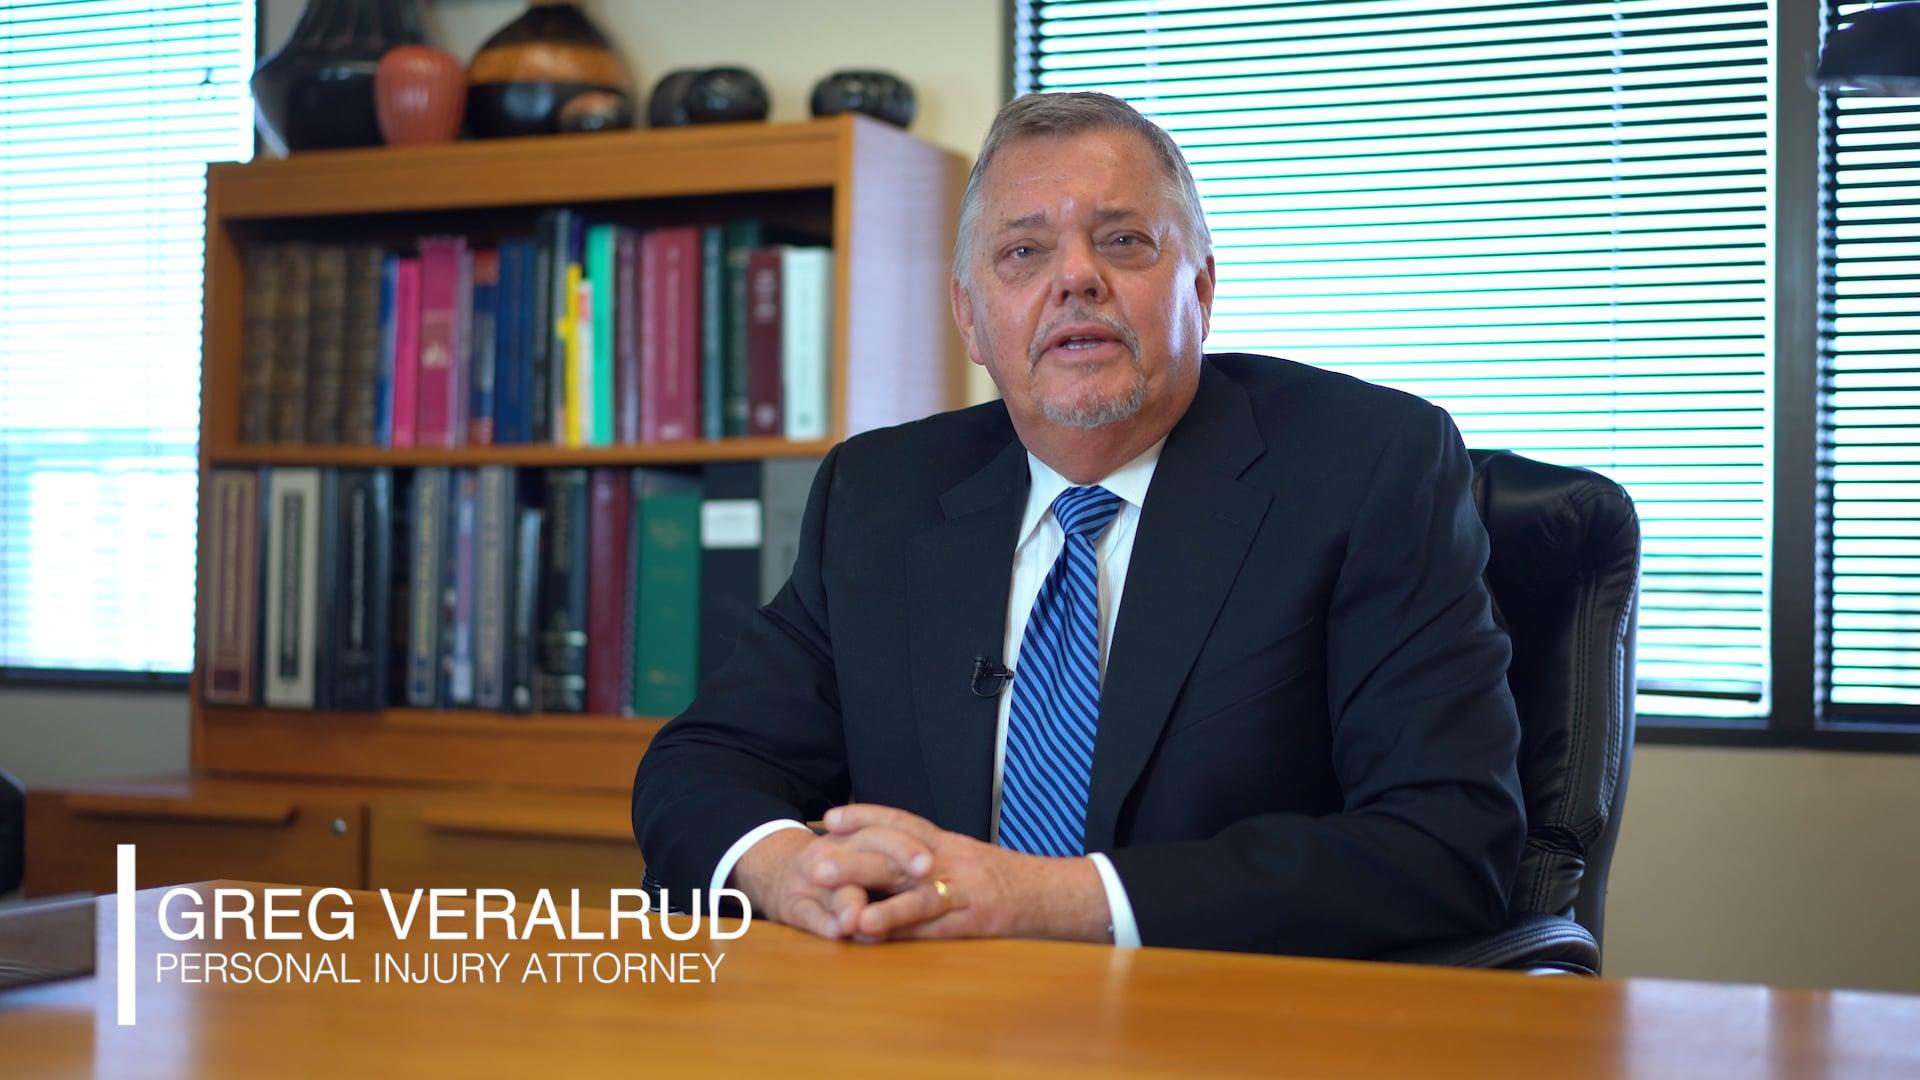 Veralrud   Personal Injury Attorney